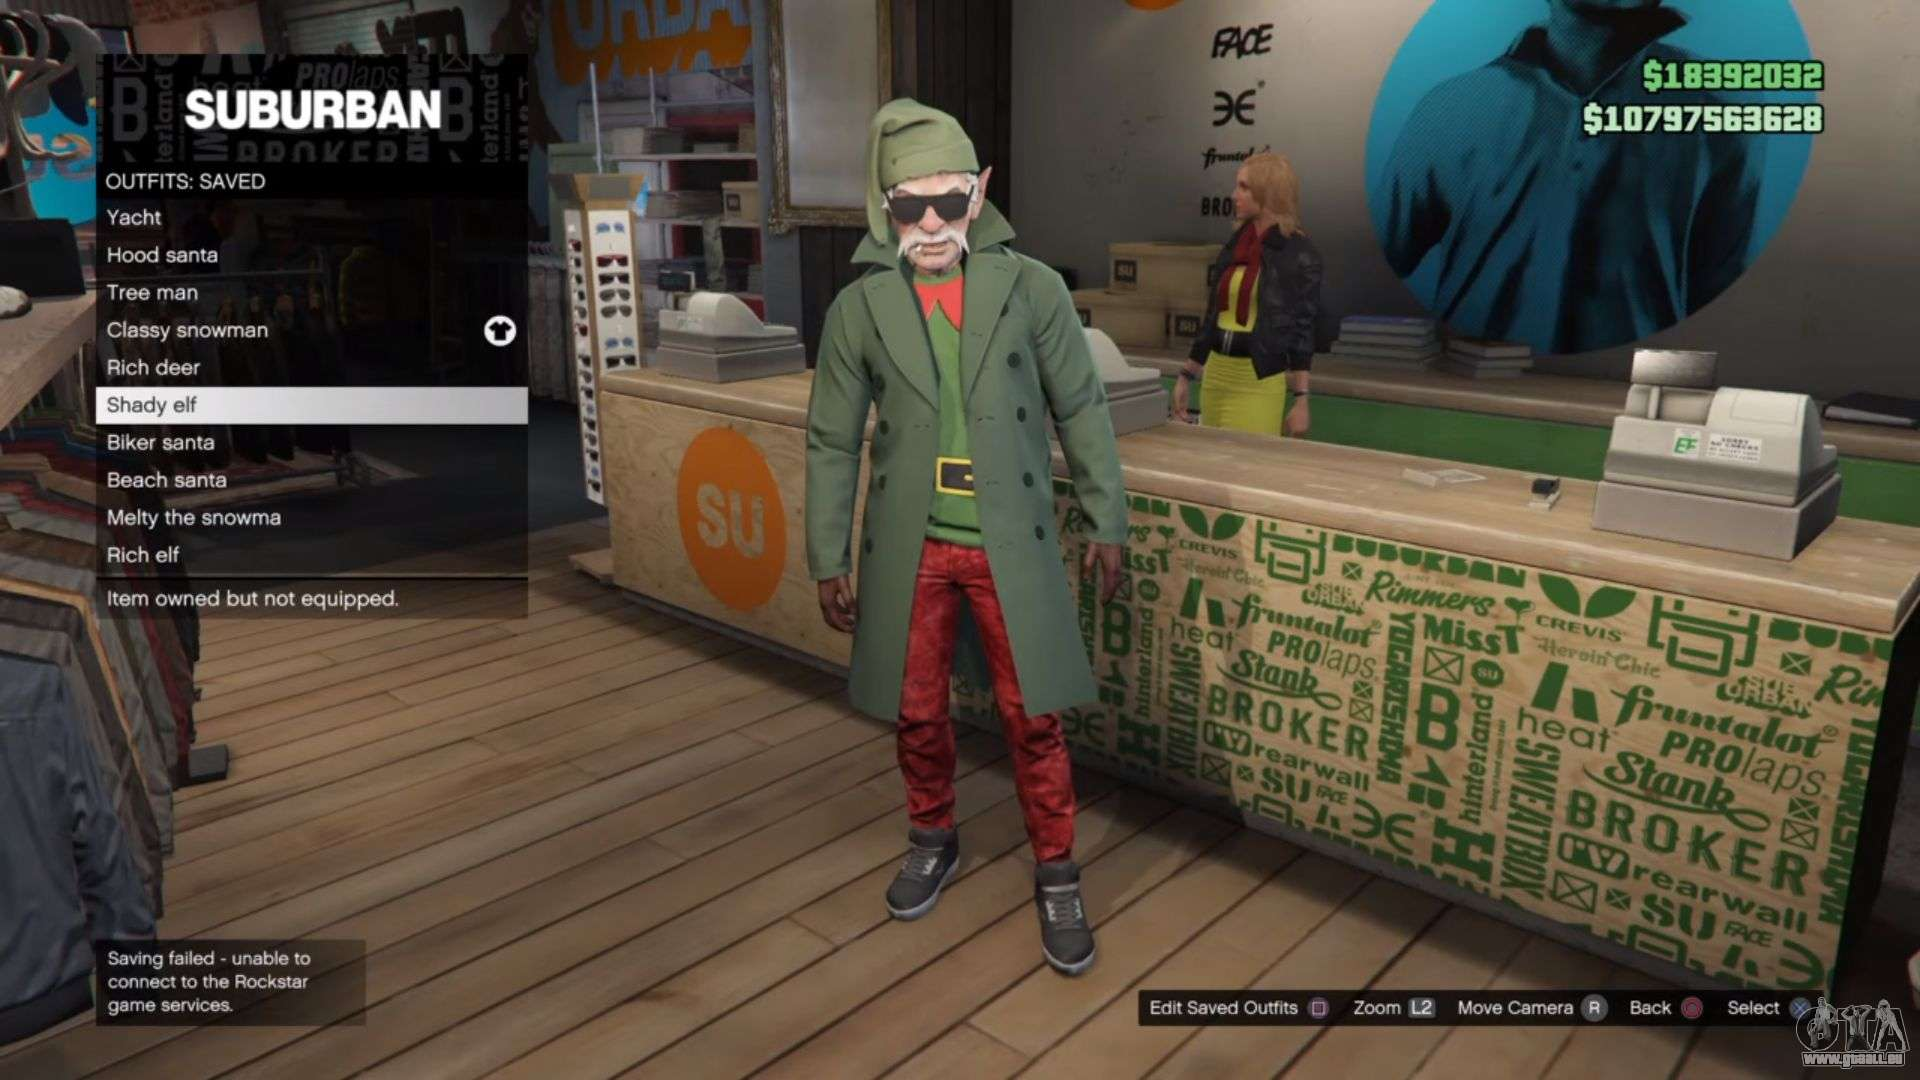 the sonic flare gamer video - festliche kostüme in gta online